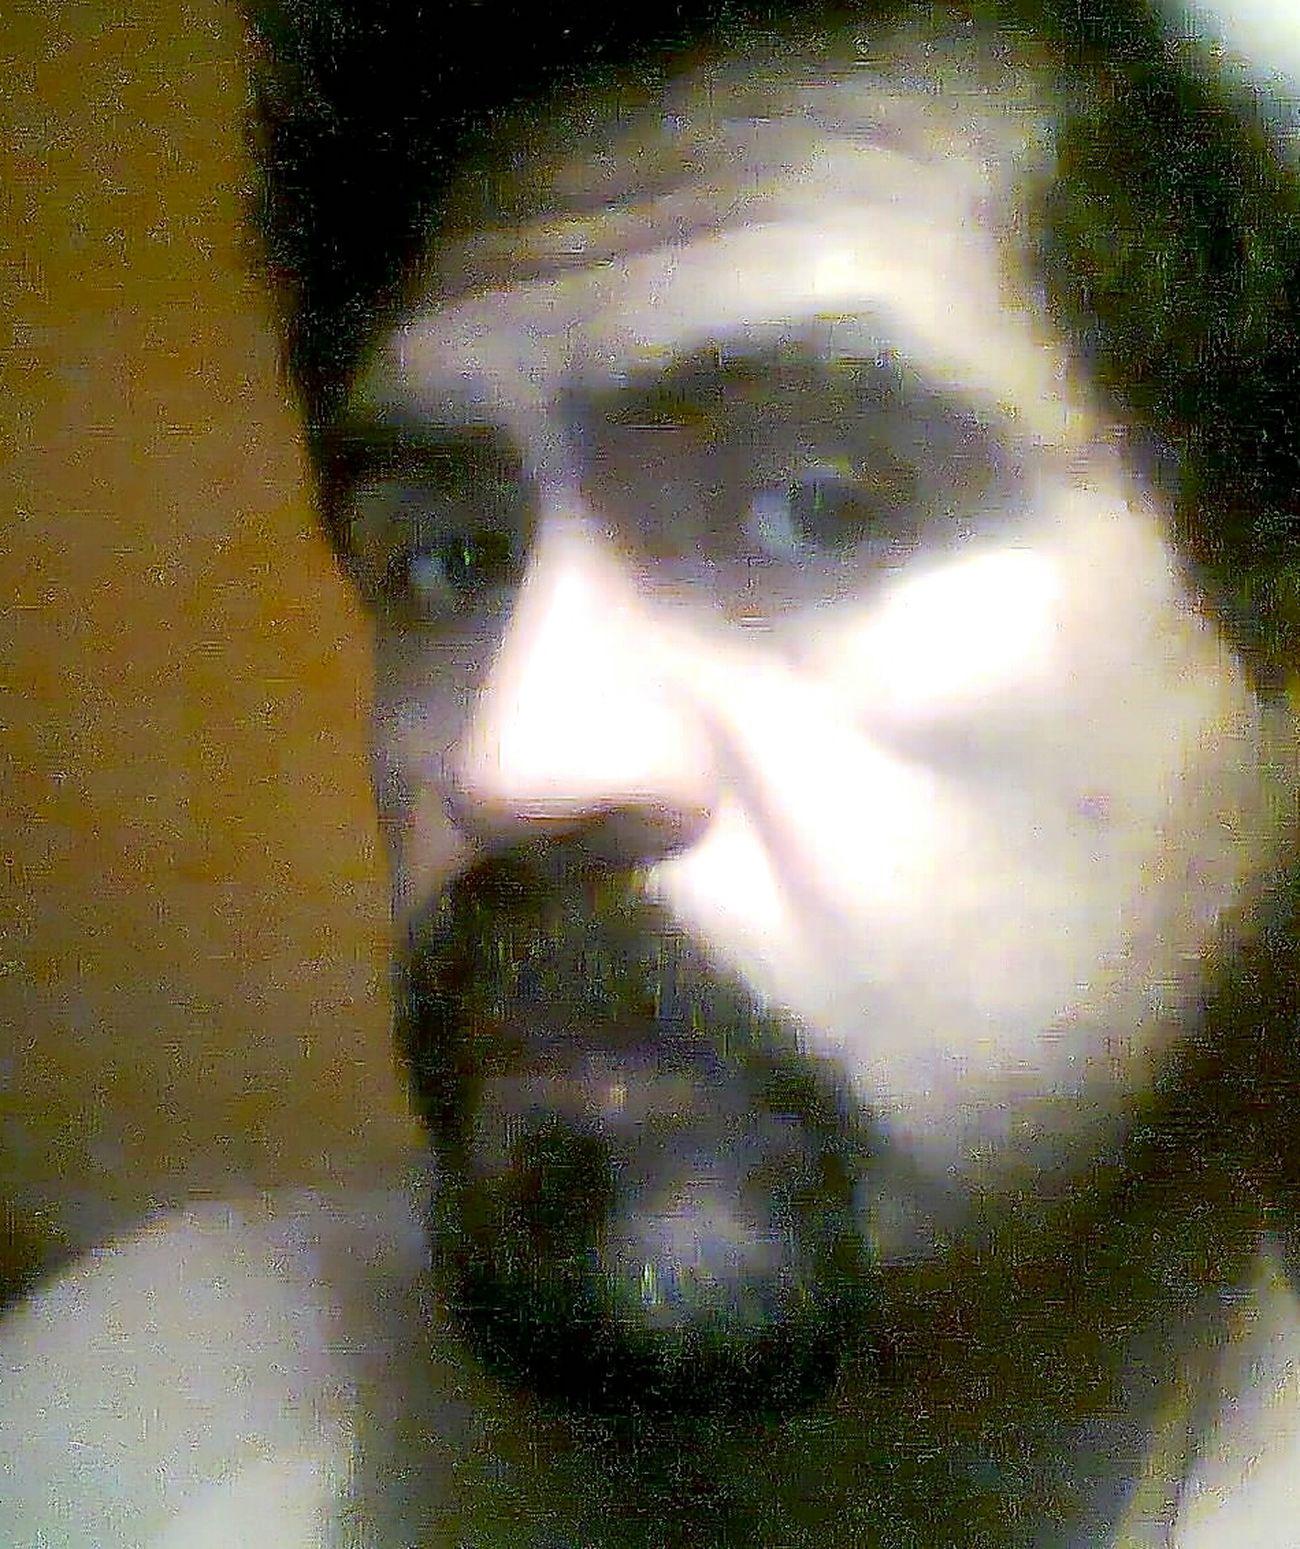 No Edit No Filter No Makeup Just My Funny Face!